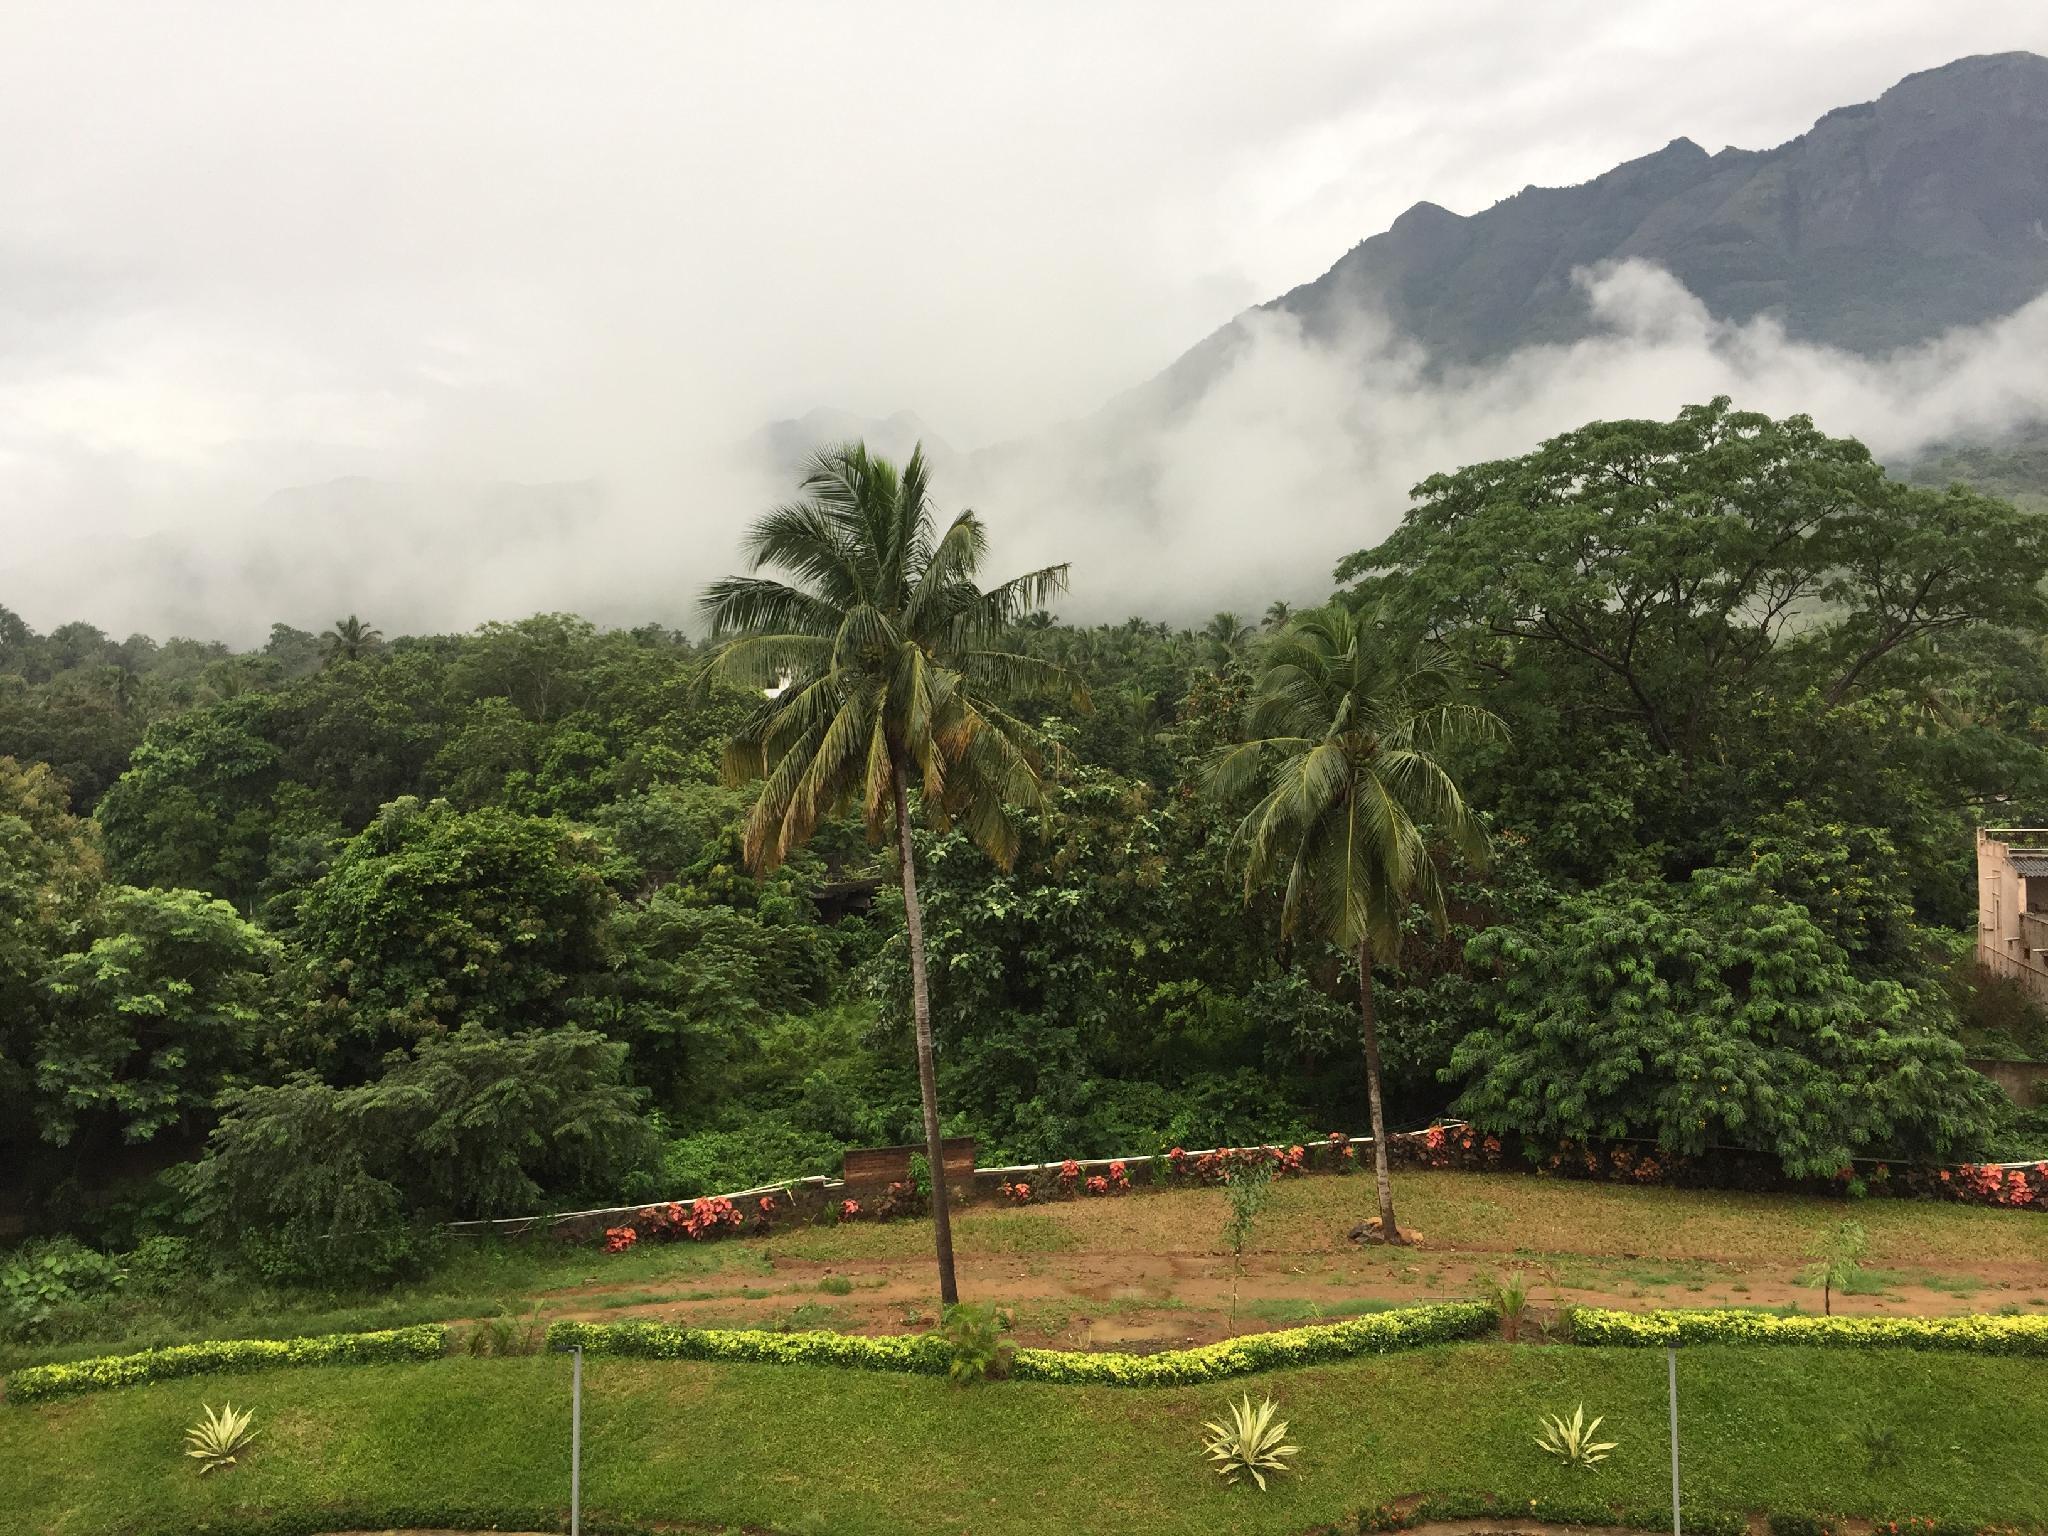 Five Falls Resort - Courtallam, Tirunelveli